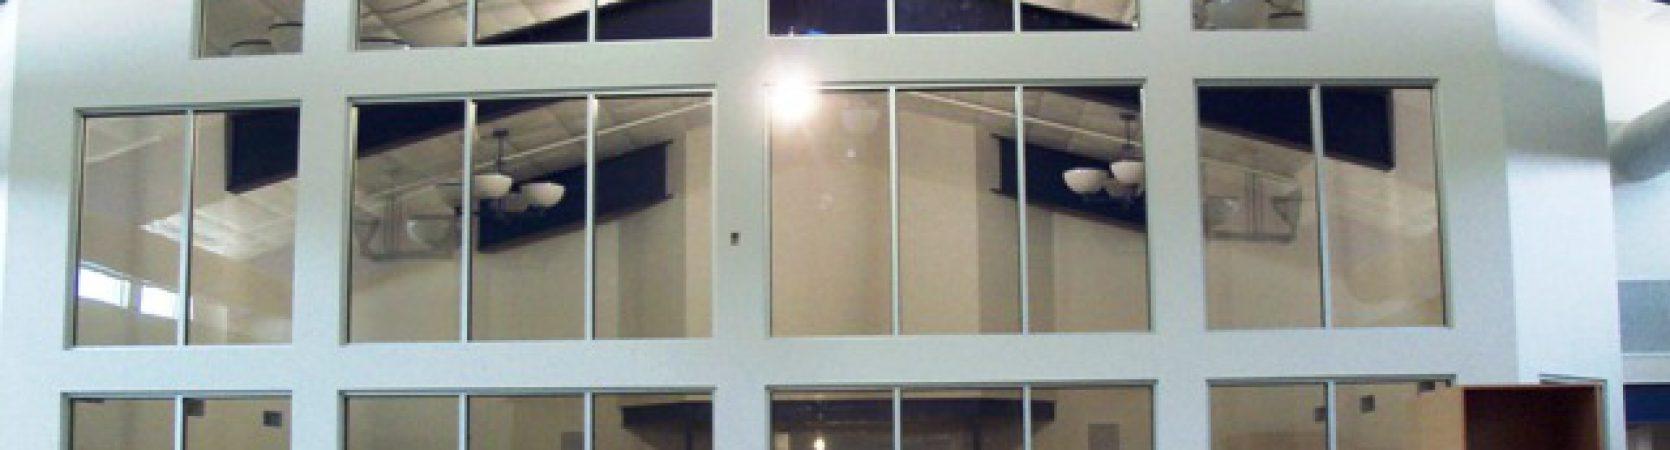 Ponca Nebraska public schools addition remodel under budget